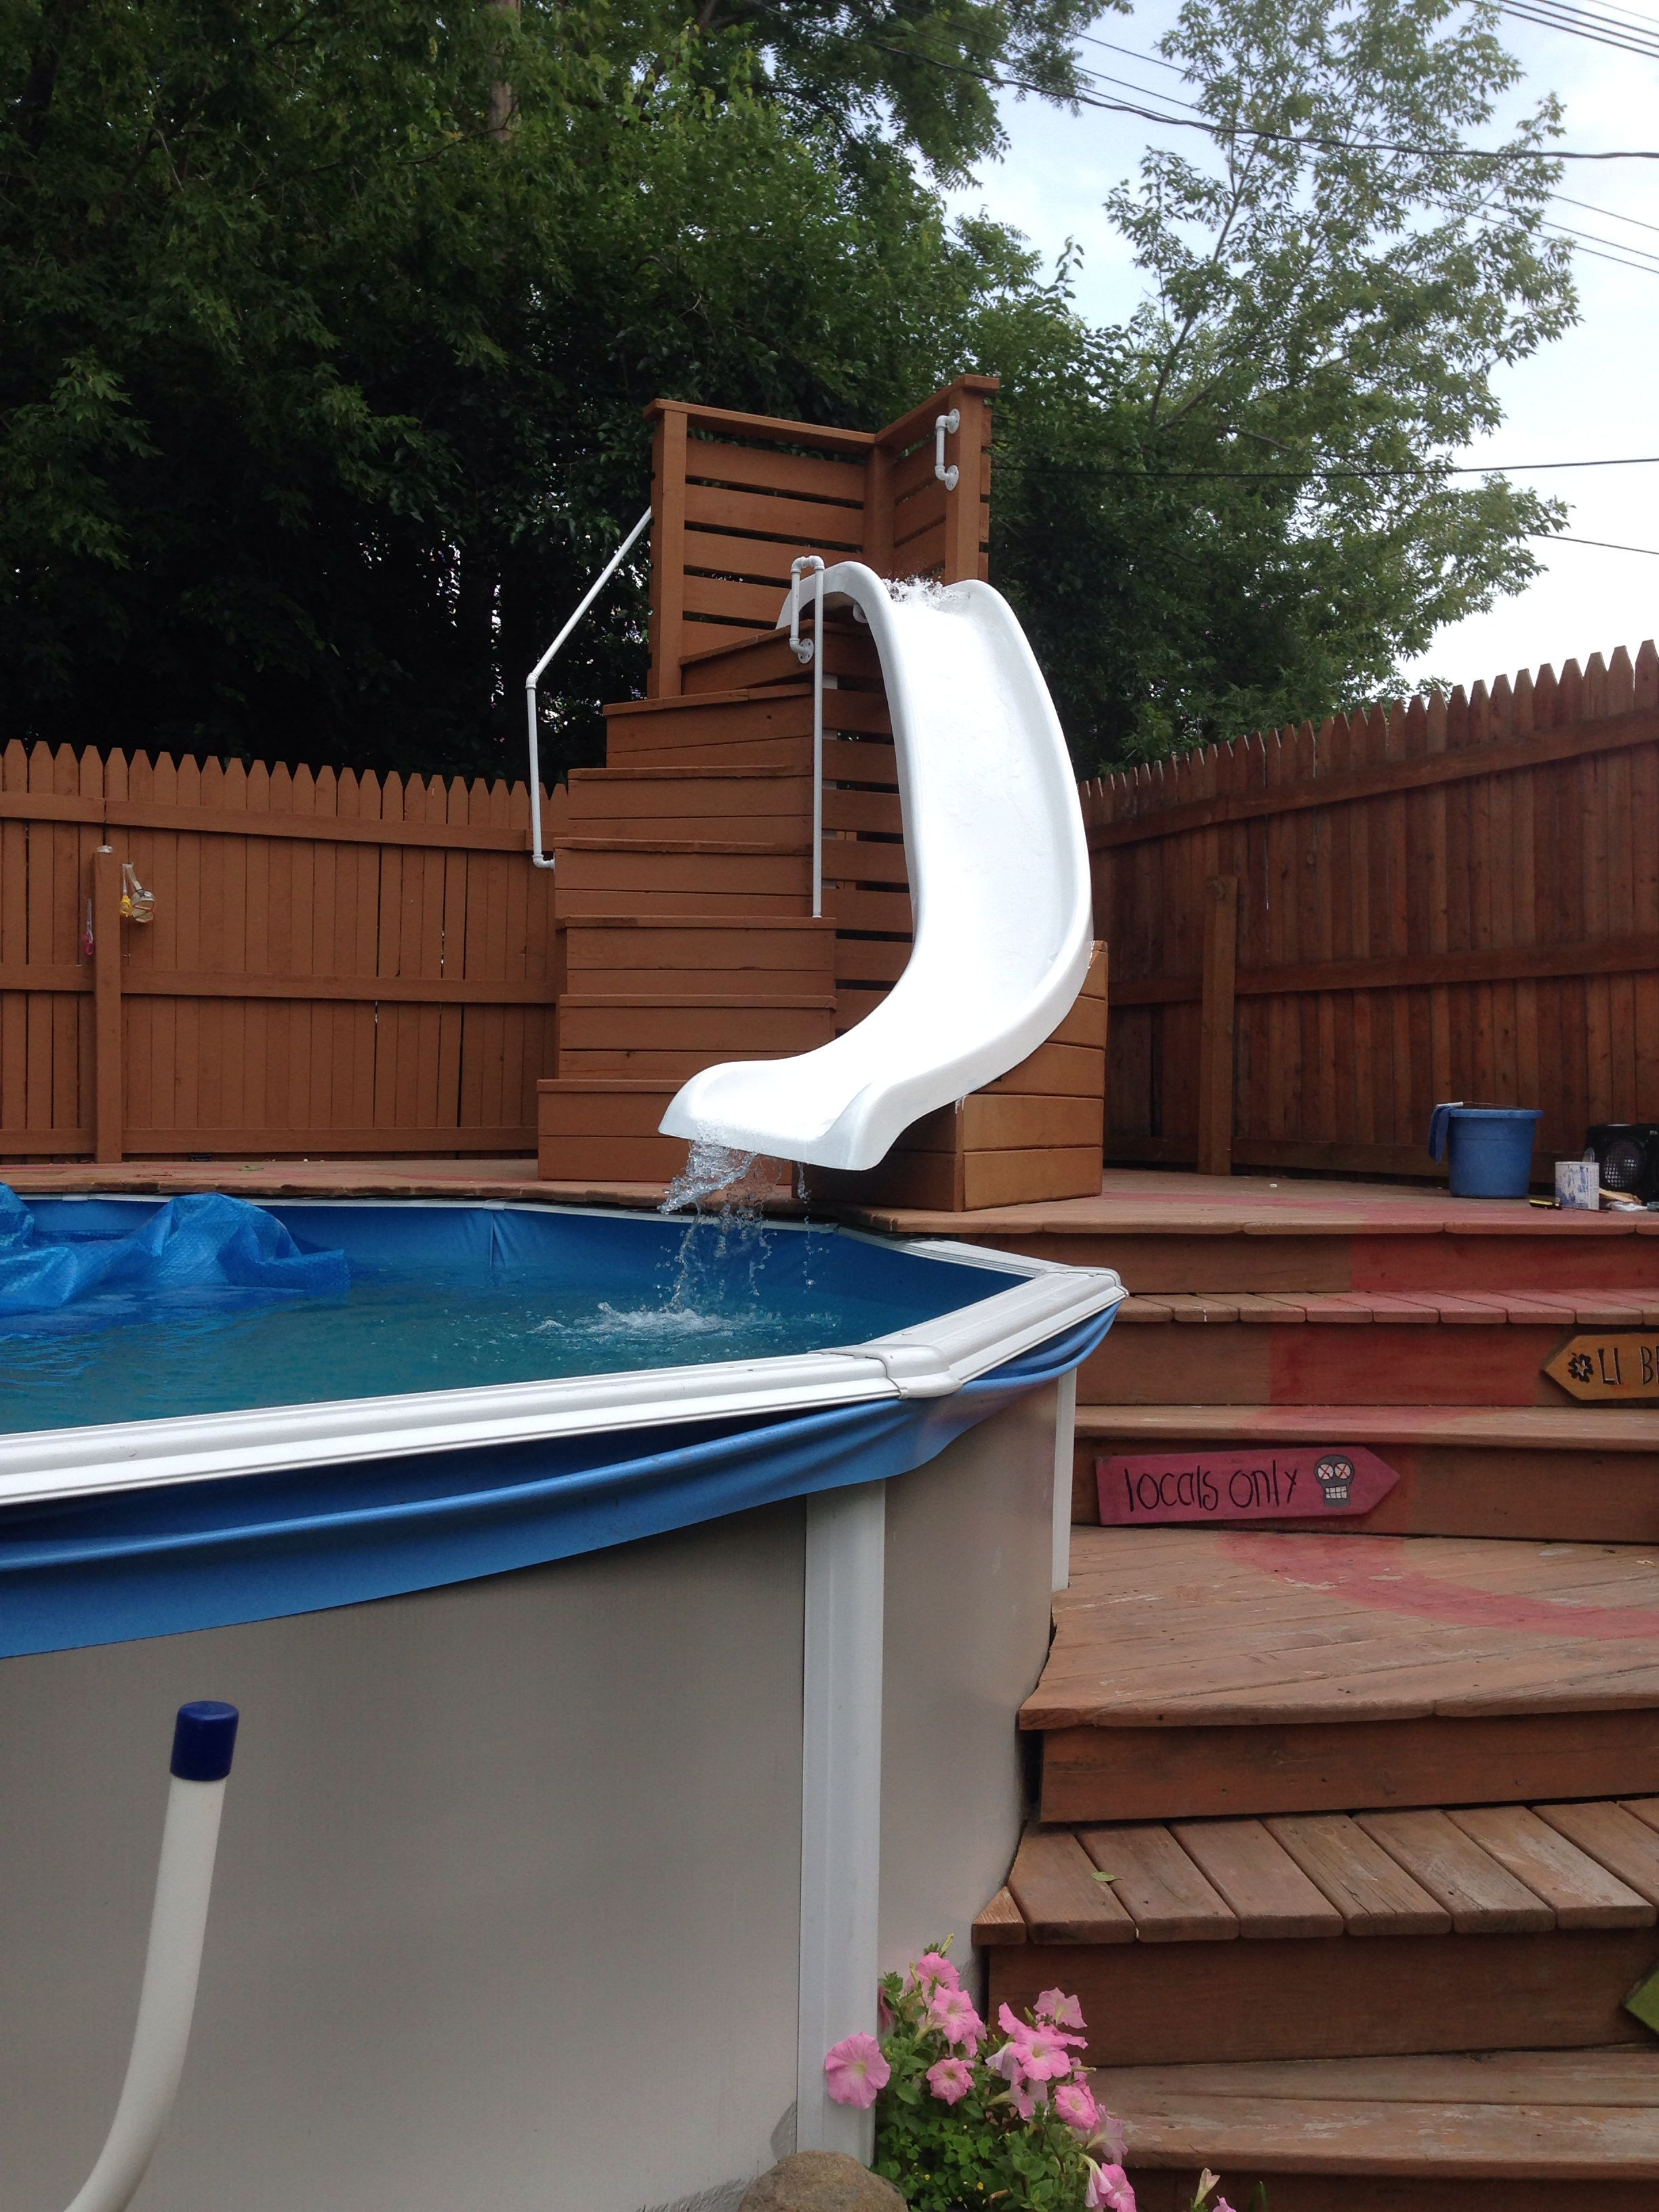 Pool Slide Swimming Pool Slides Diy Swimming Pool Backyard Pool